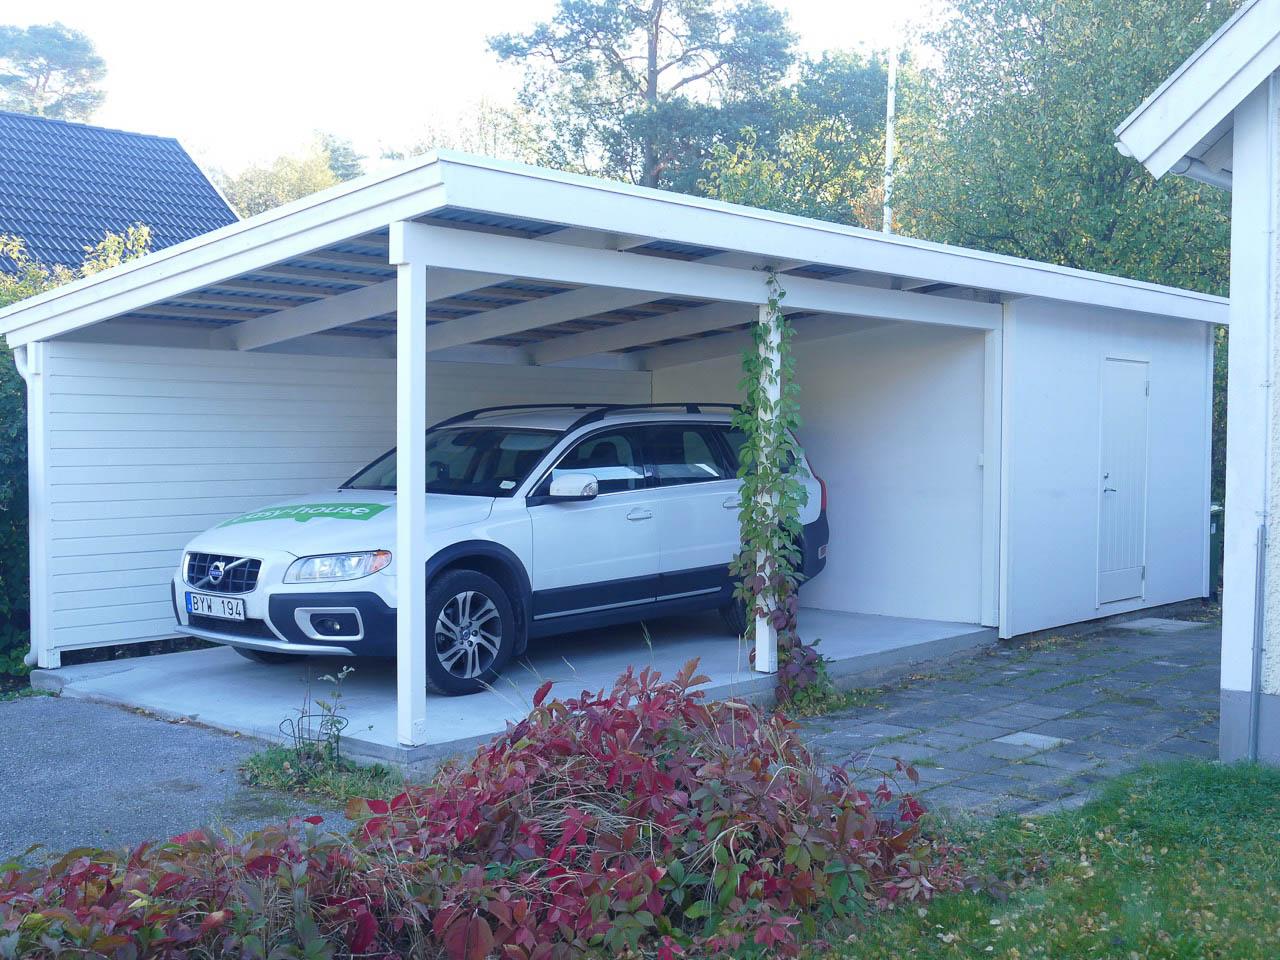 easy-house-specialhus--carport.jpg